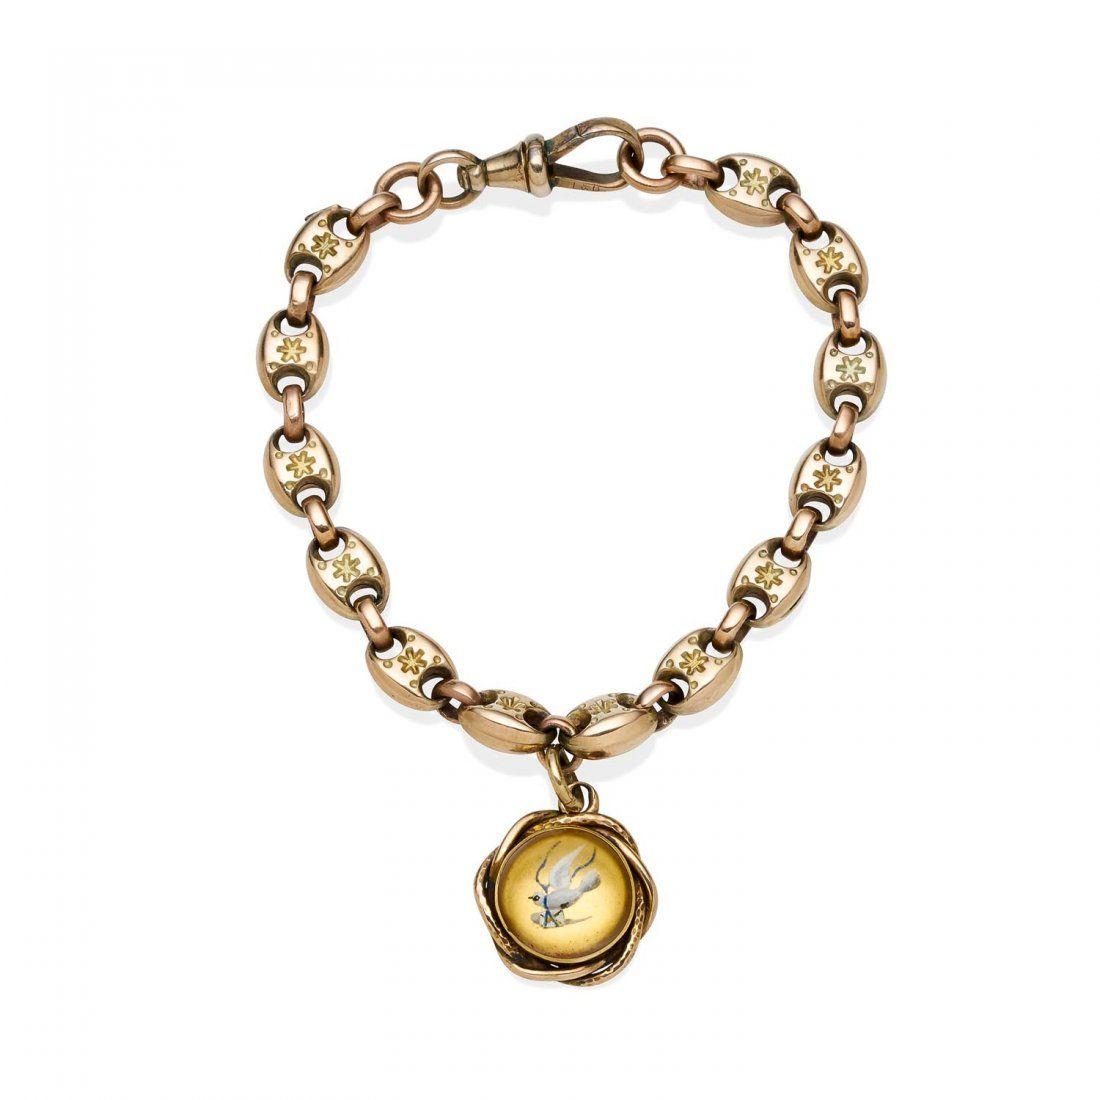 A Victorian gold bracelet, of hollow gucci link design